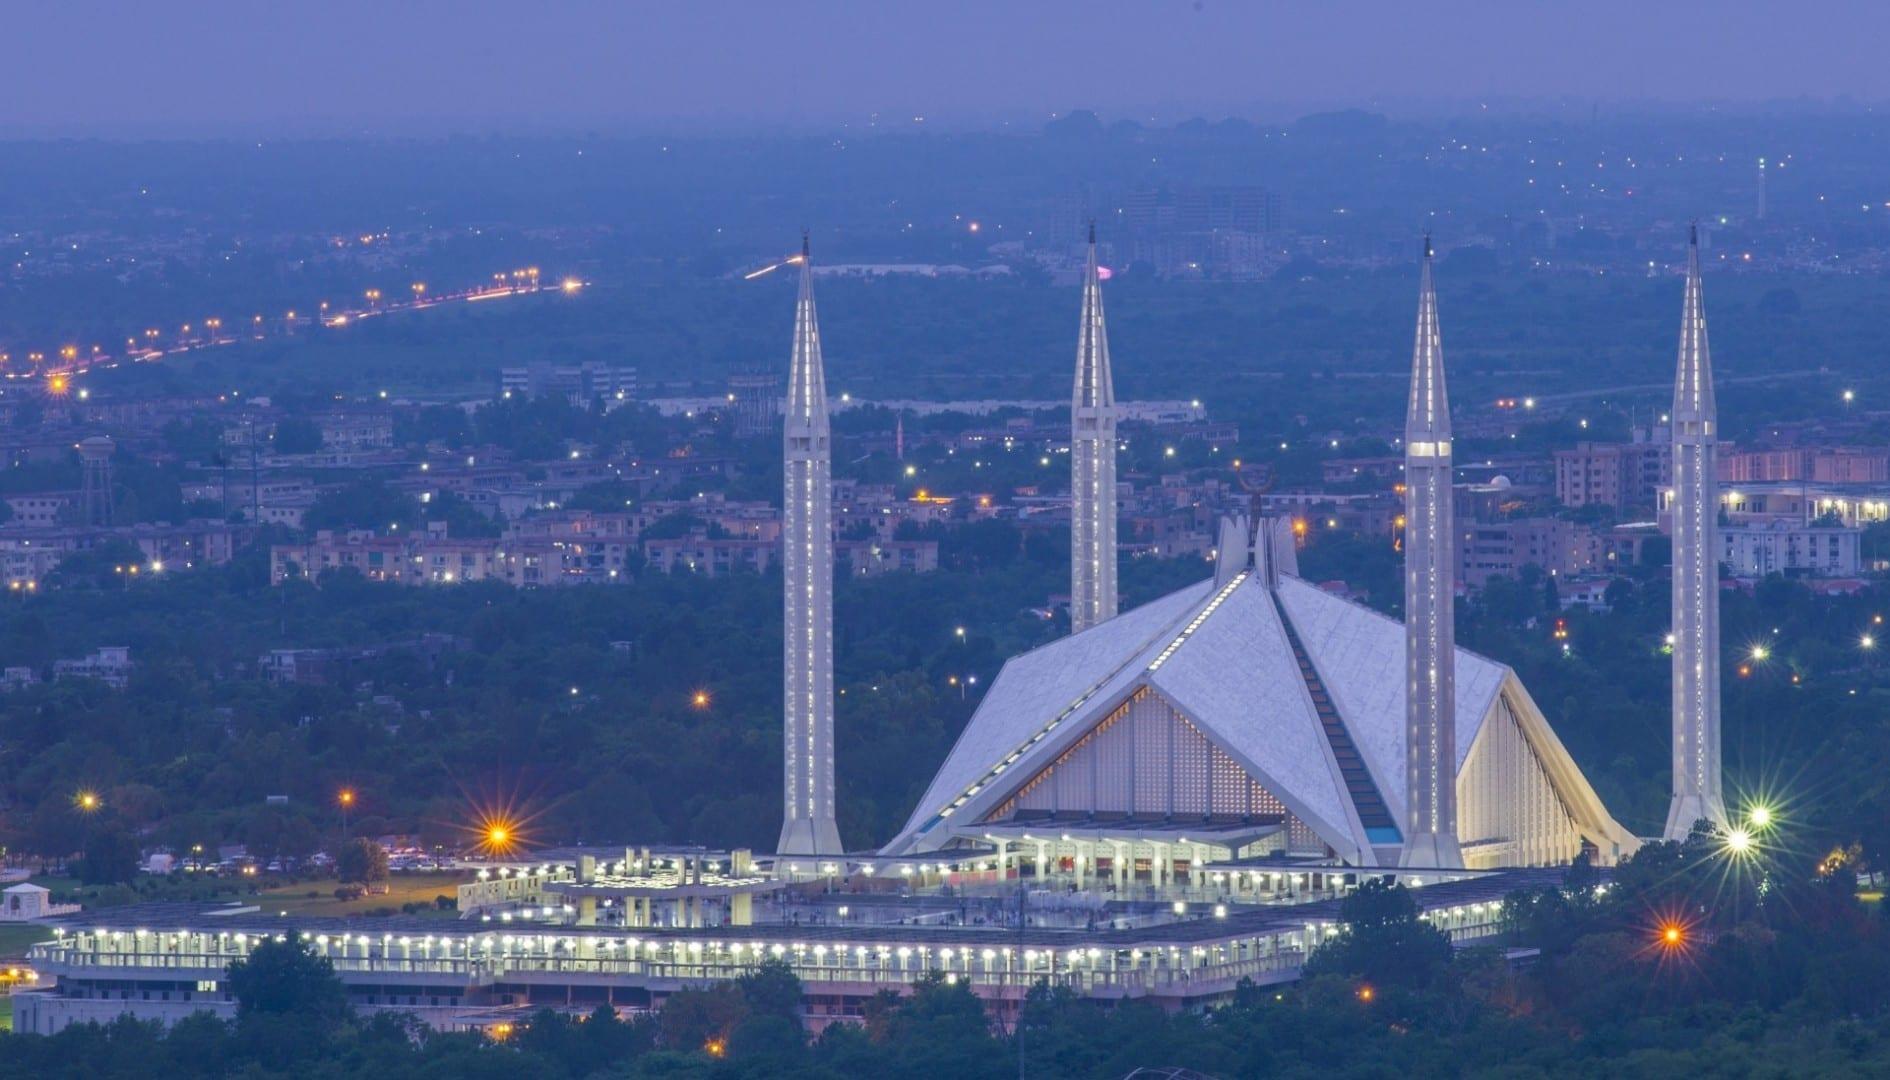 La mezquita nacional de Pakistán, Mezquita de Faisal Islamabad Pakistán